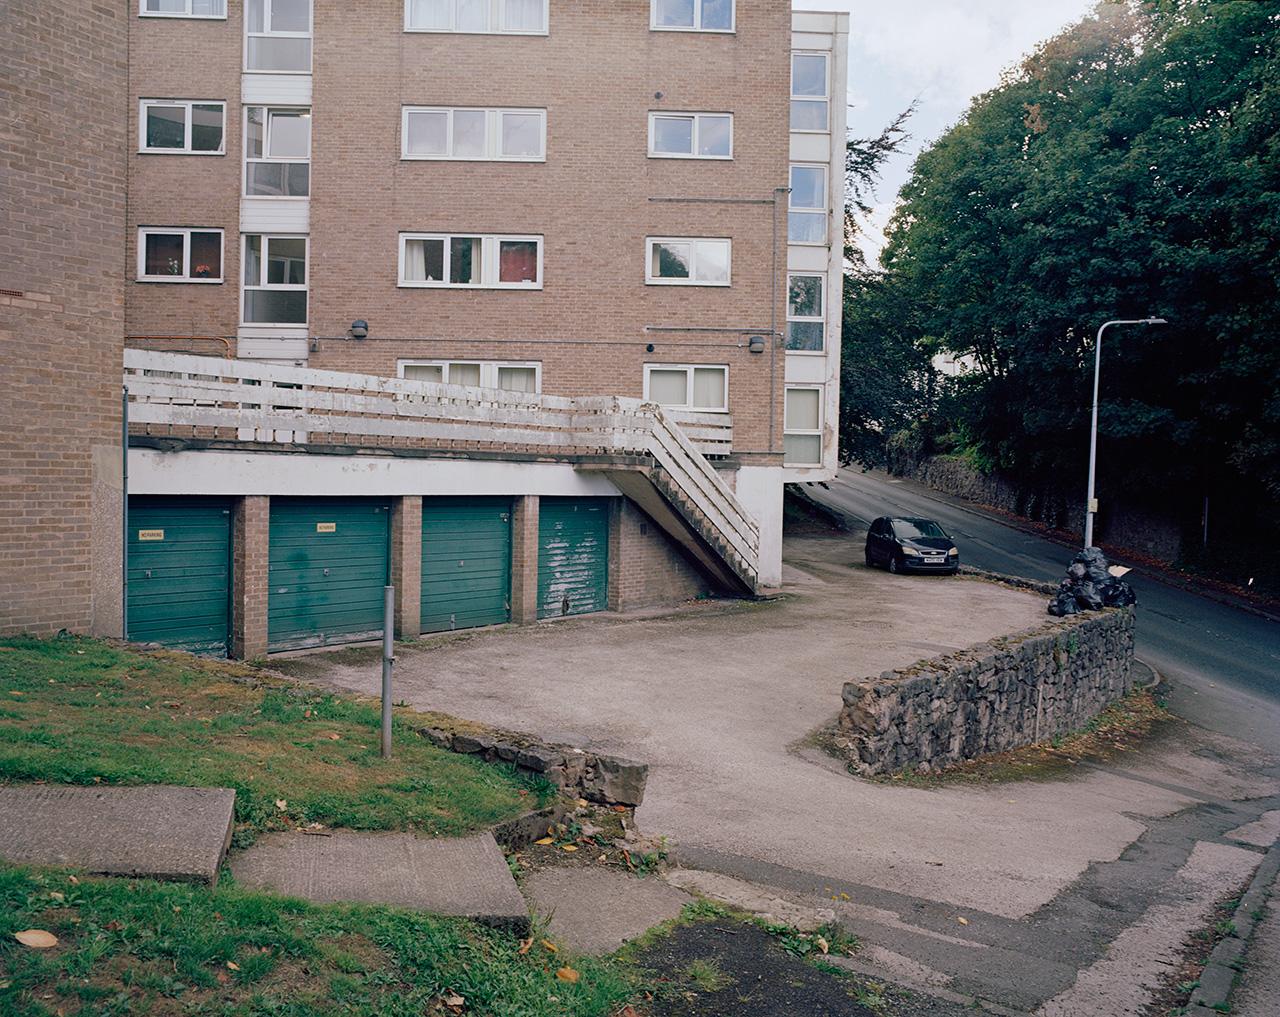 greenfield-house-car-001.jpg